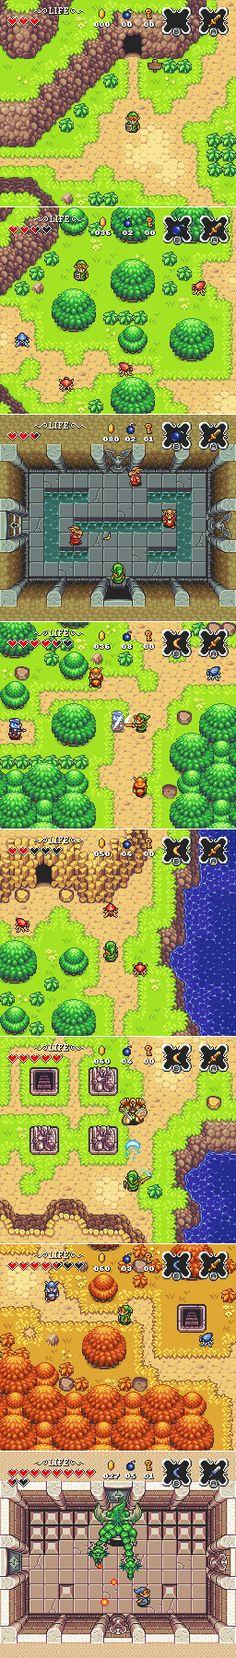 Legend of Zelda Remake